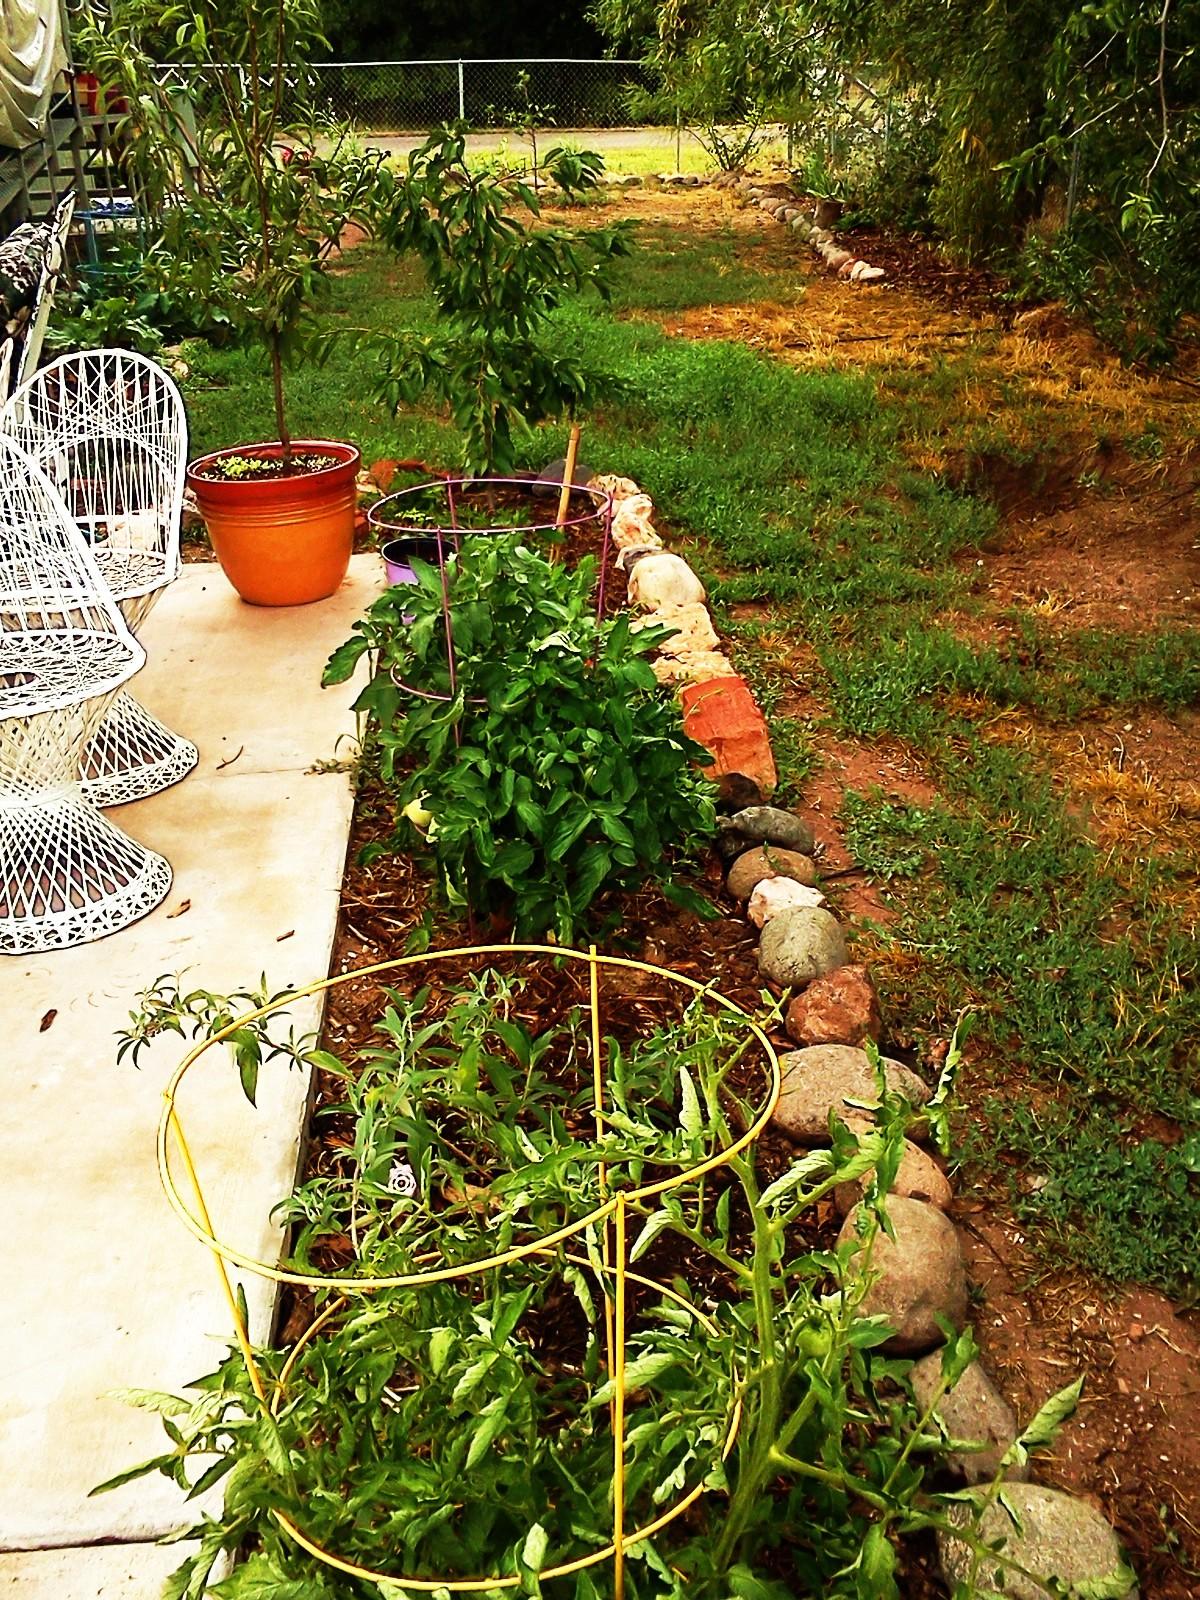 Garden July 2015 026.jpg